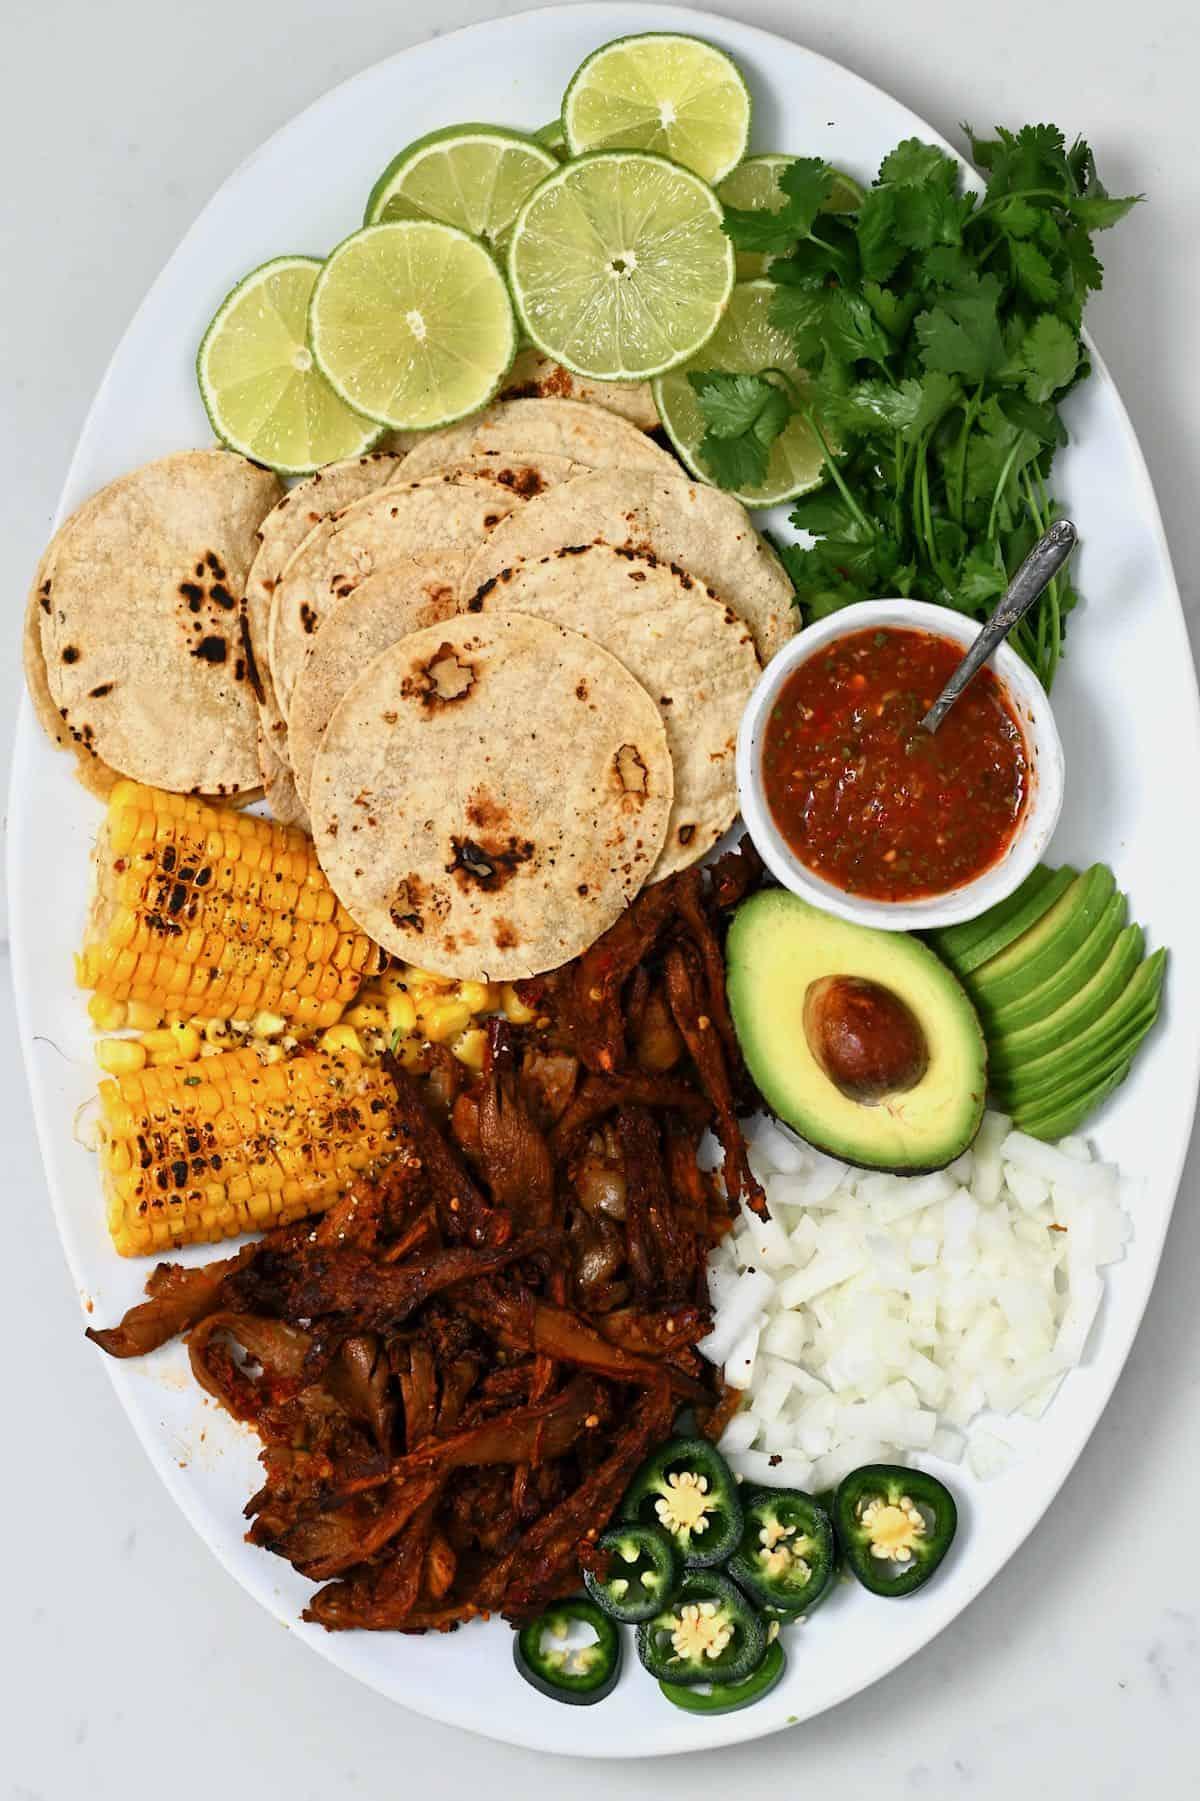 Birria mushroom taco elements on a platter